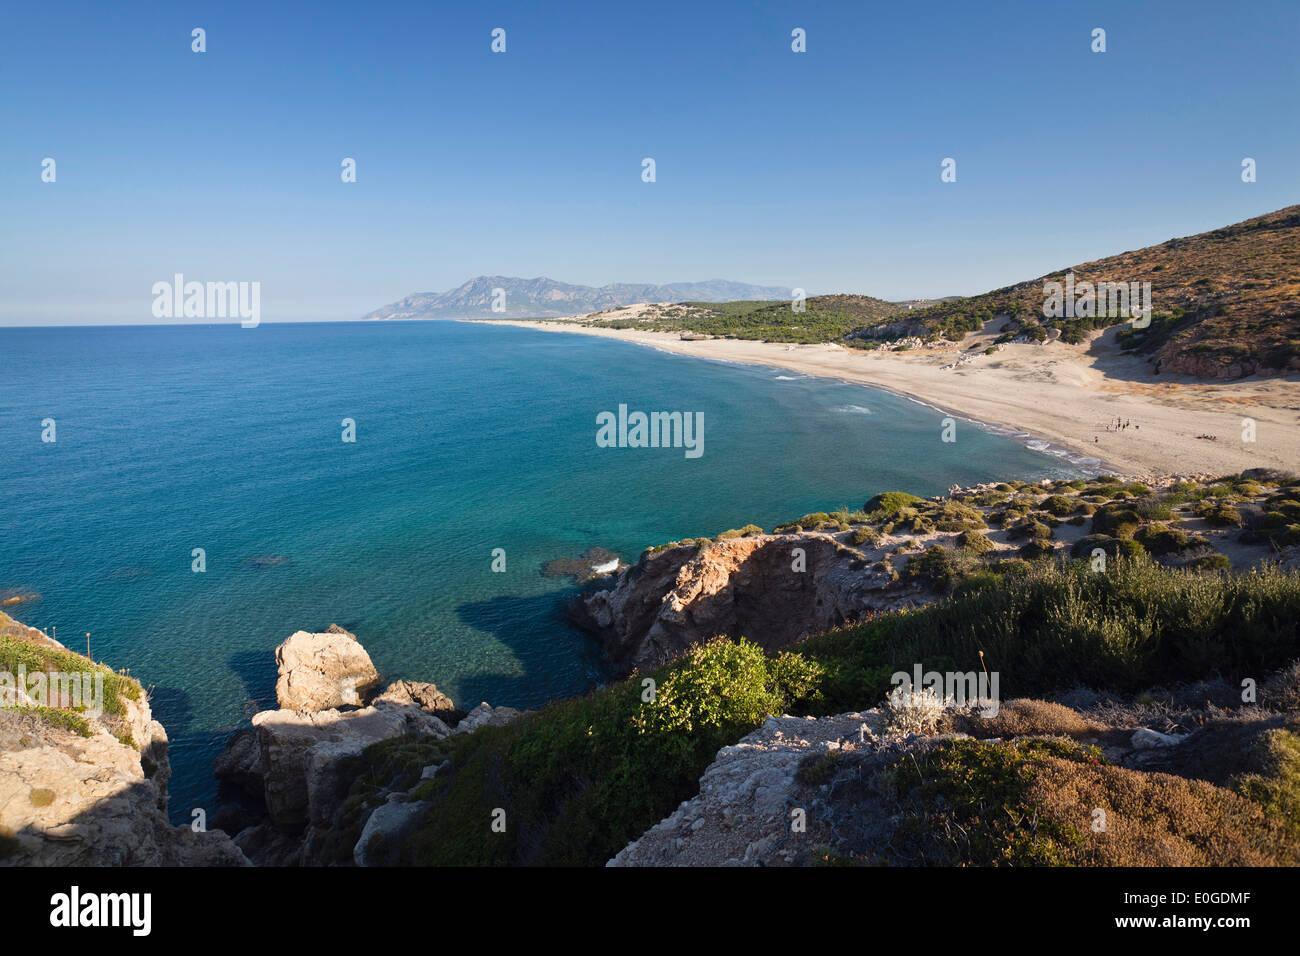 Sandy beach of Patara, lycian coast, Mediterranean Sea, Turkey - Stock Image